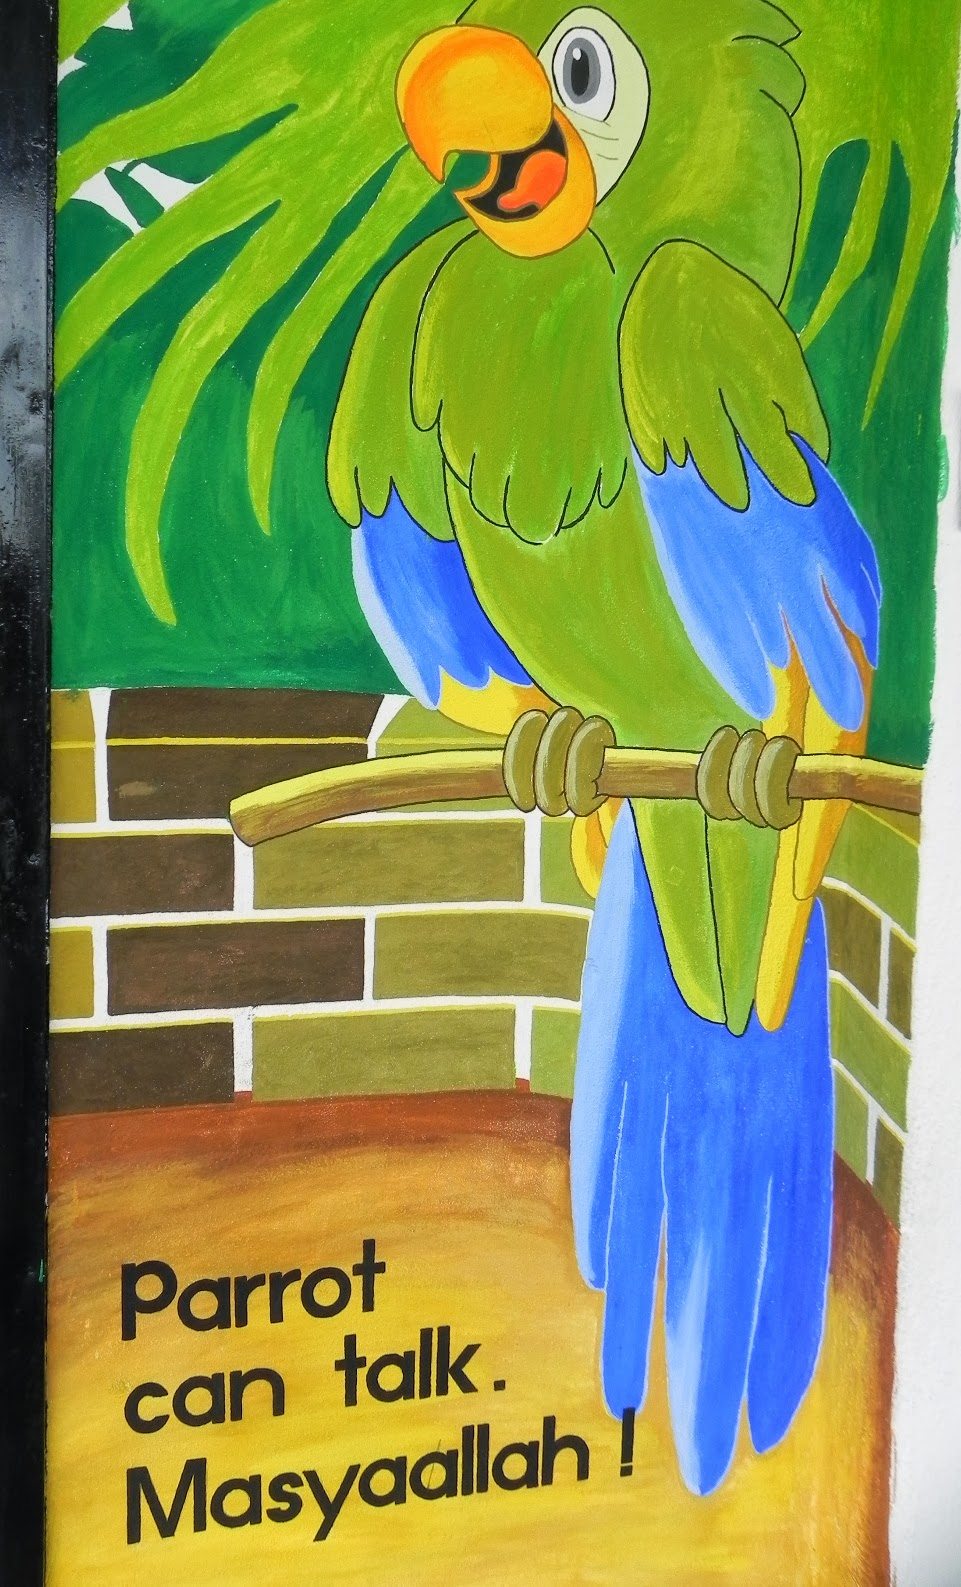 Inspirasi mawaddah jika ke bilik air pun for Contoh lukisan mural tadika